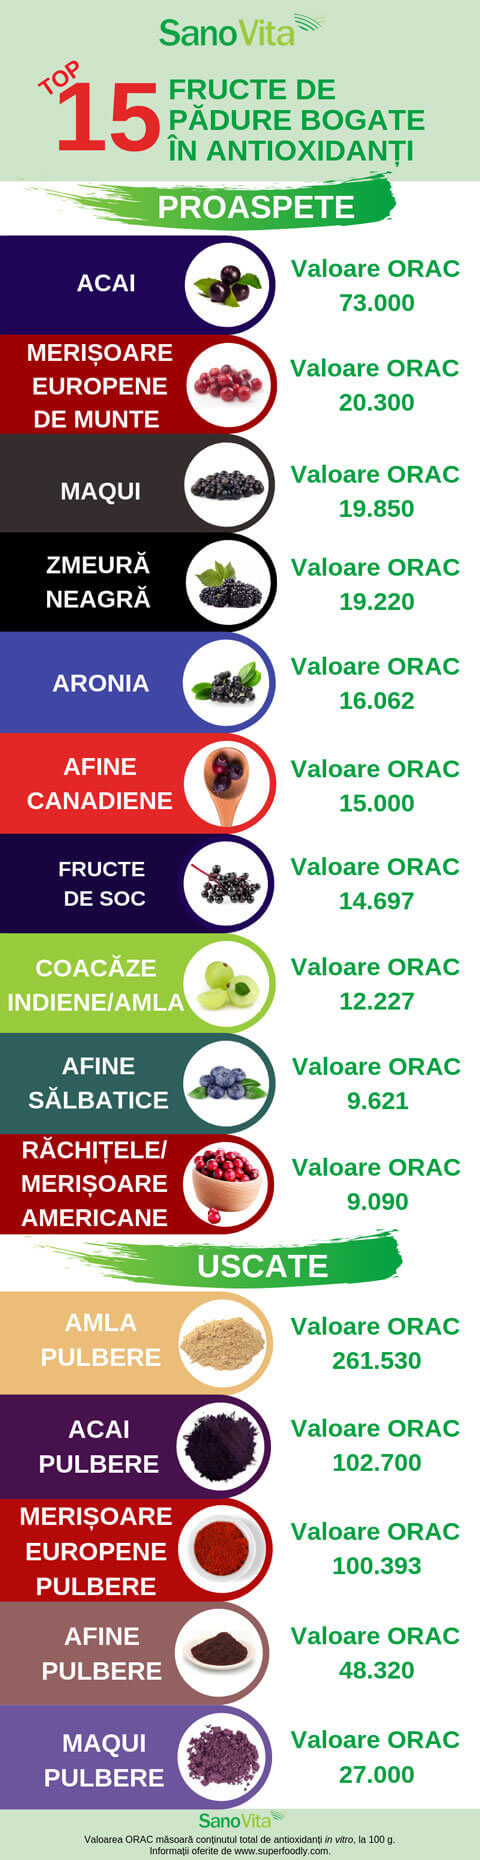 Top 15 fructe de padure bogate in antioxidanti - infografic